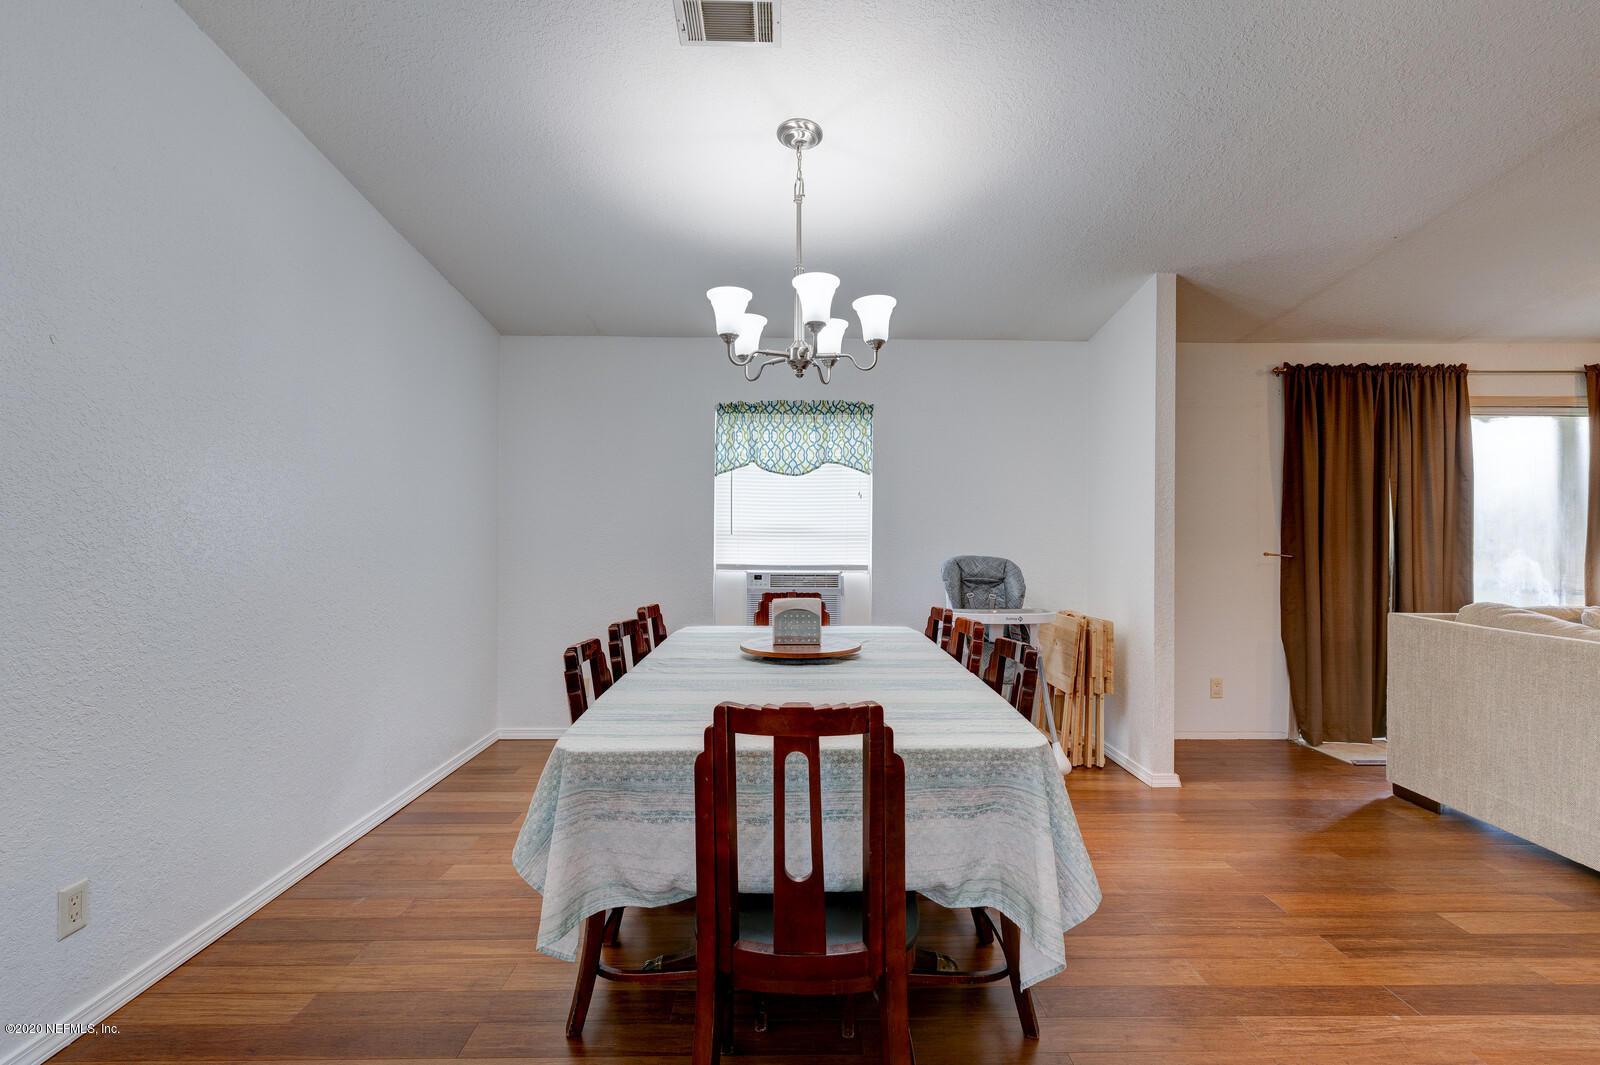 7505 APPOMATTOX, KEYSTONE HEIGHTS, FLORIDA 32656, 3 Bedrooms Bedrooms, ,2 BathroomsBathrooms,Residential,For sale,APPOMATTOX,1082517